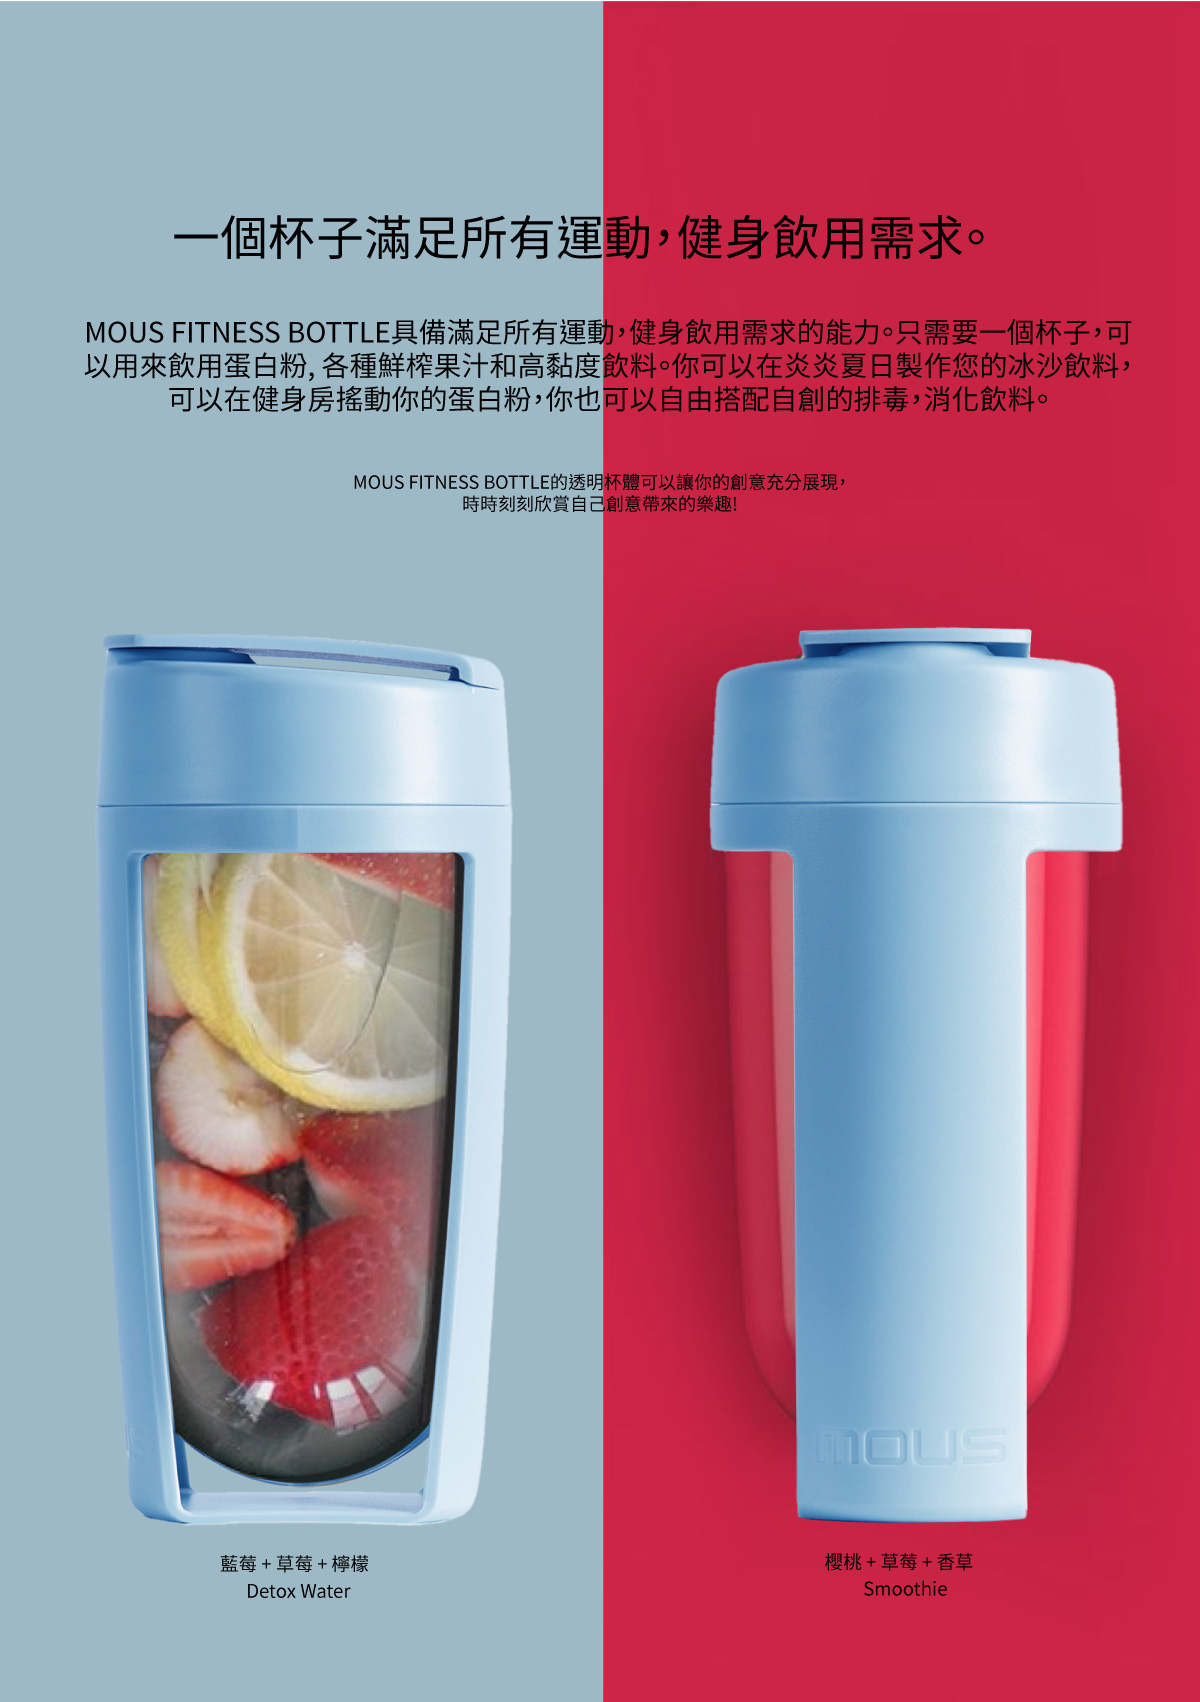 MOUS FITNESS bottle light blue運動健身搖搖杯裝著多種水果及紅色背景